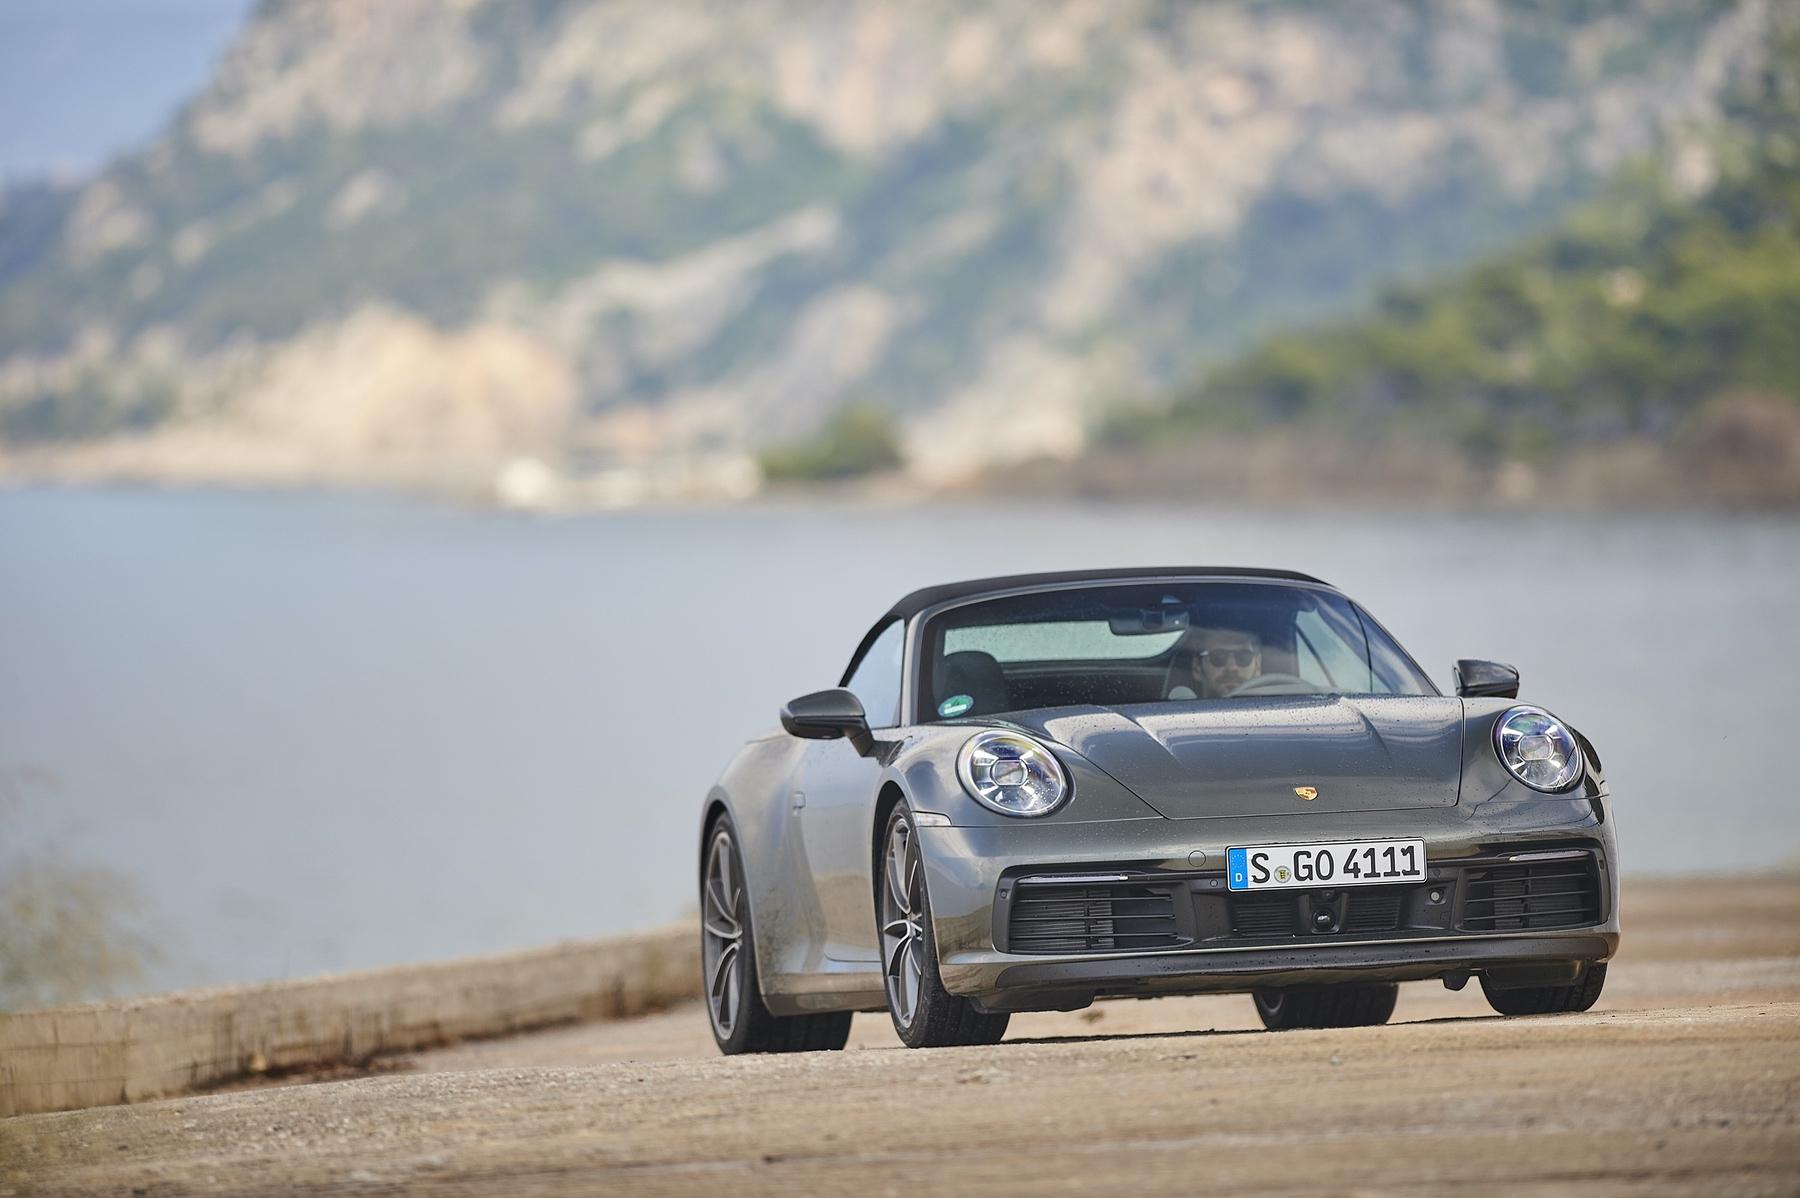 Test_Drive_Porsche_911_Athens_0114